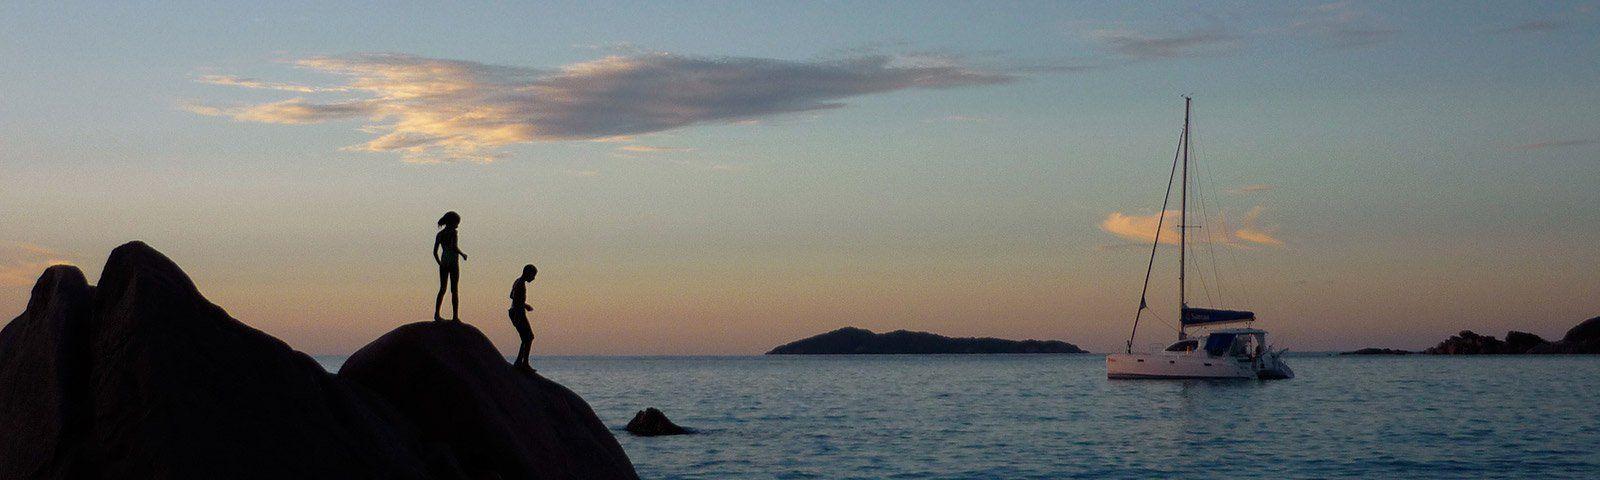 travesia-barco-tailandia-catamaran (20)